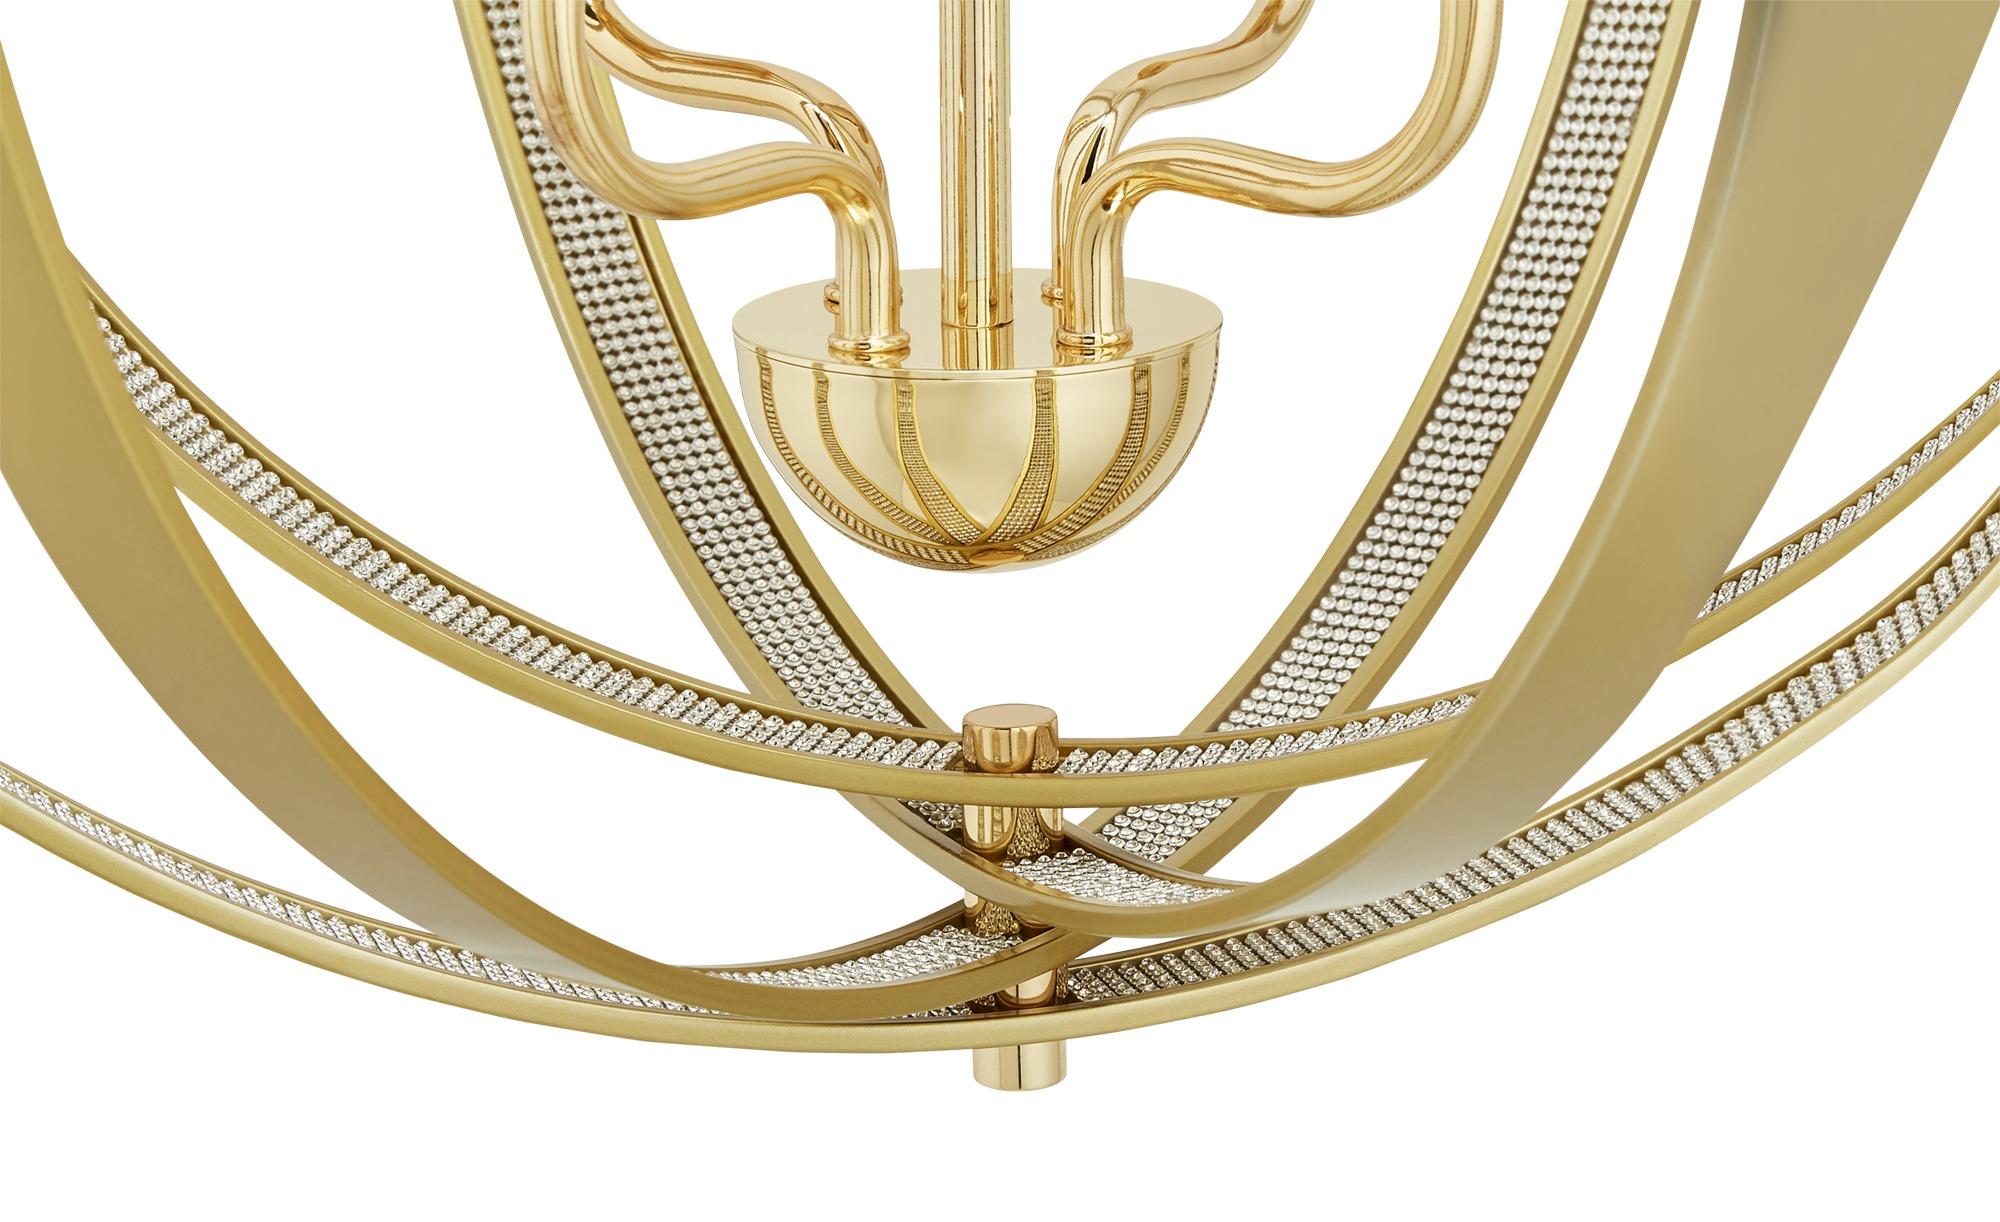 Trio Kronleuchter, 4-flammig ¦ gold ¦ Maße (cm): H: 150 Ø: 56 Lampen & Leuchten > Innenleuchten > Kronleuchter - Höffner